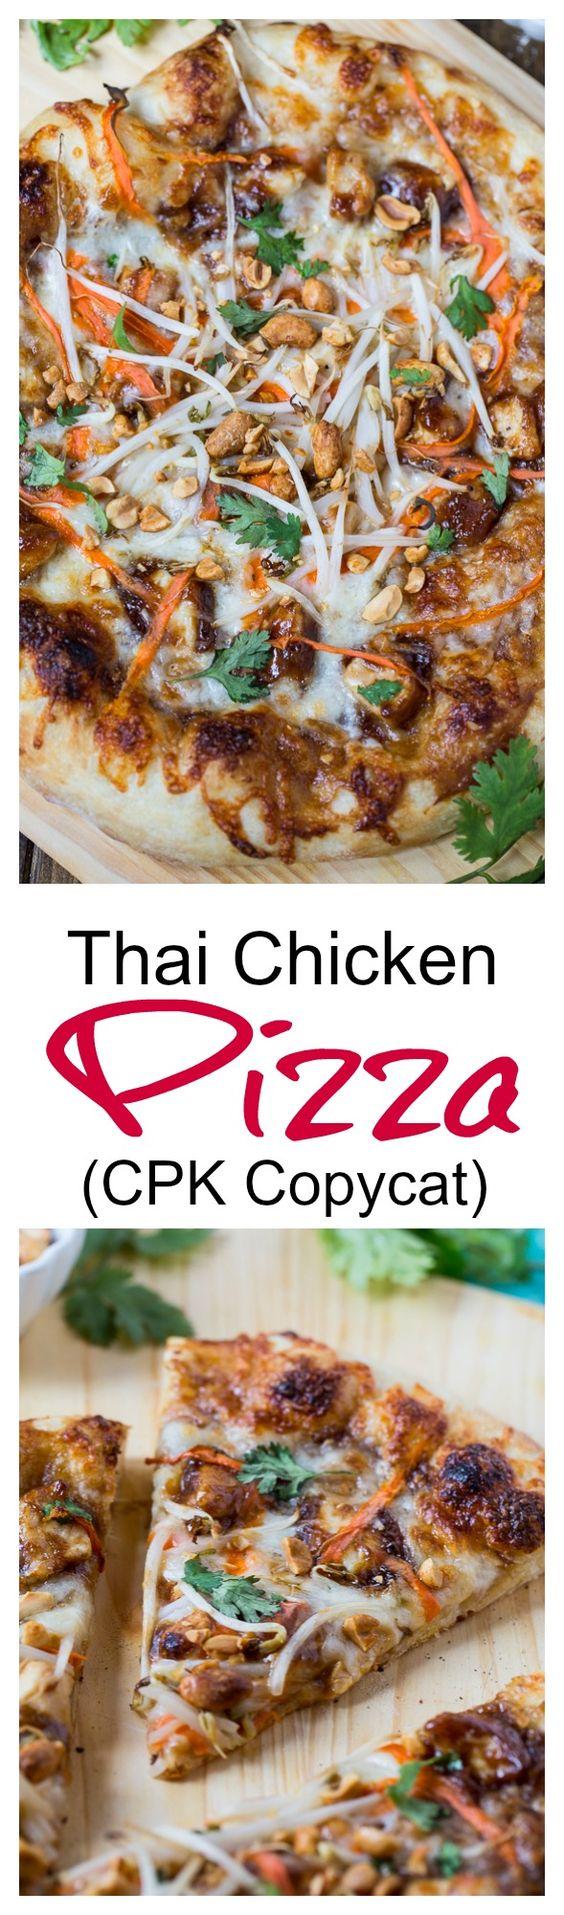 Thai Chicken Pizza (California Pizza Kitchen copycat)